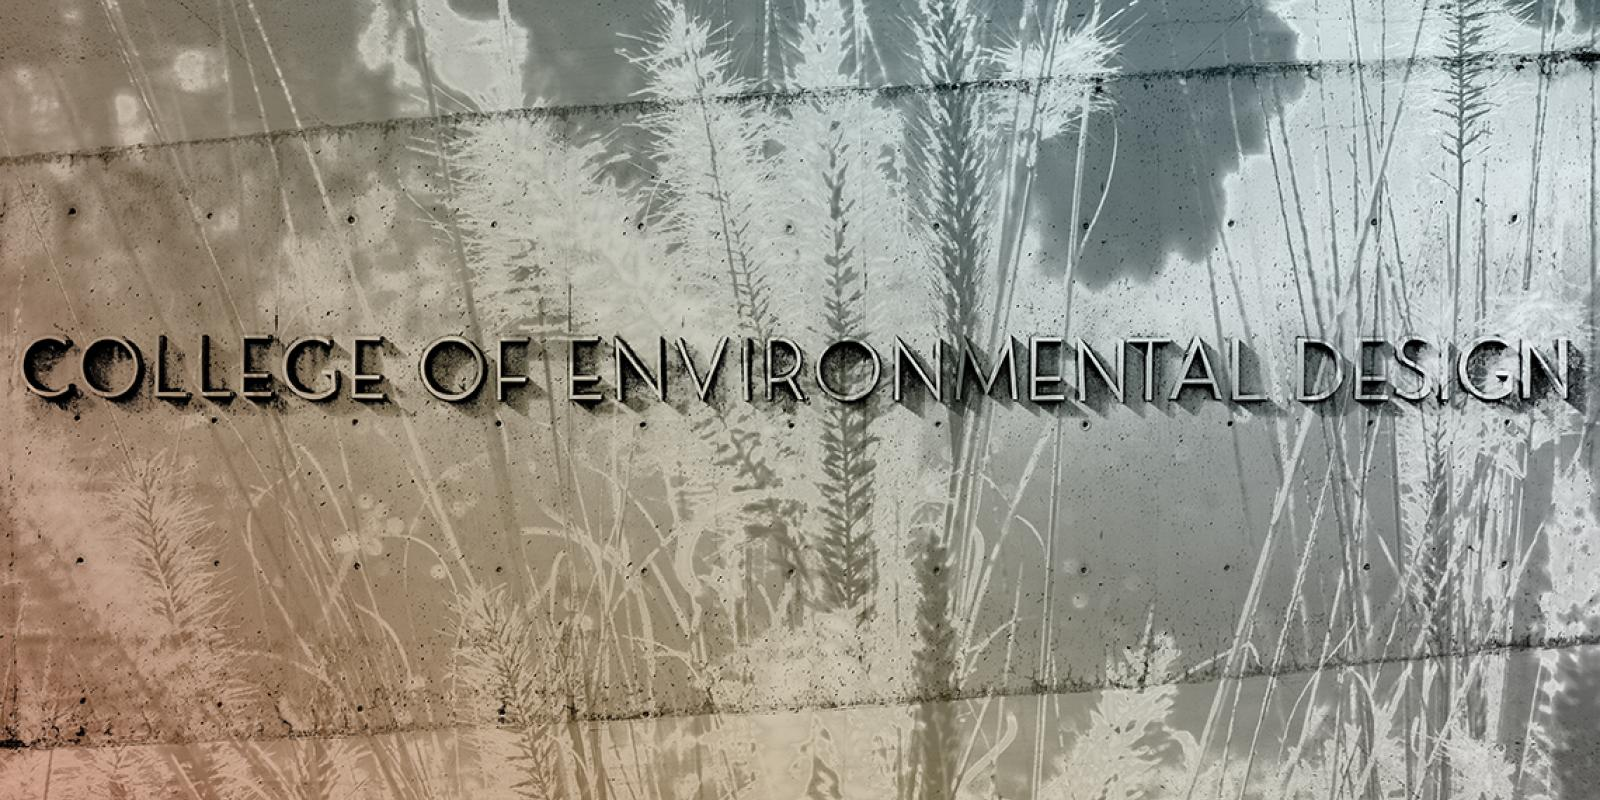 College of Environmental Design, Cal Poly Pomona (Mark Maryanovich Photography)